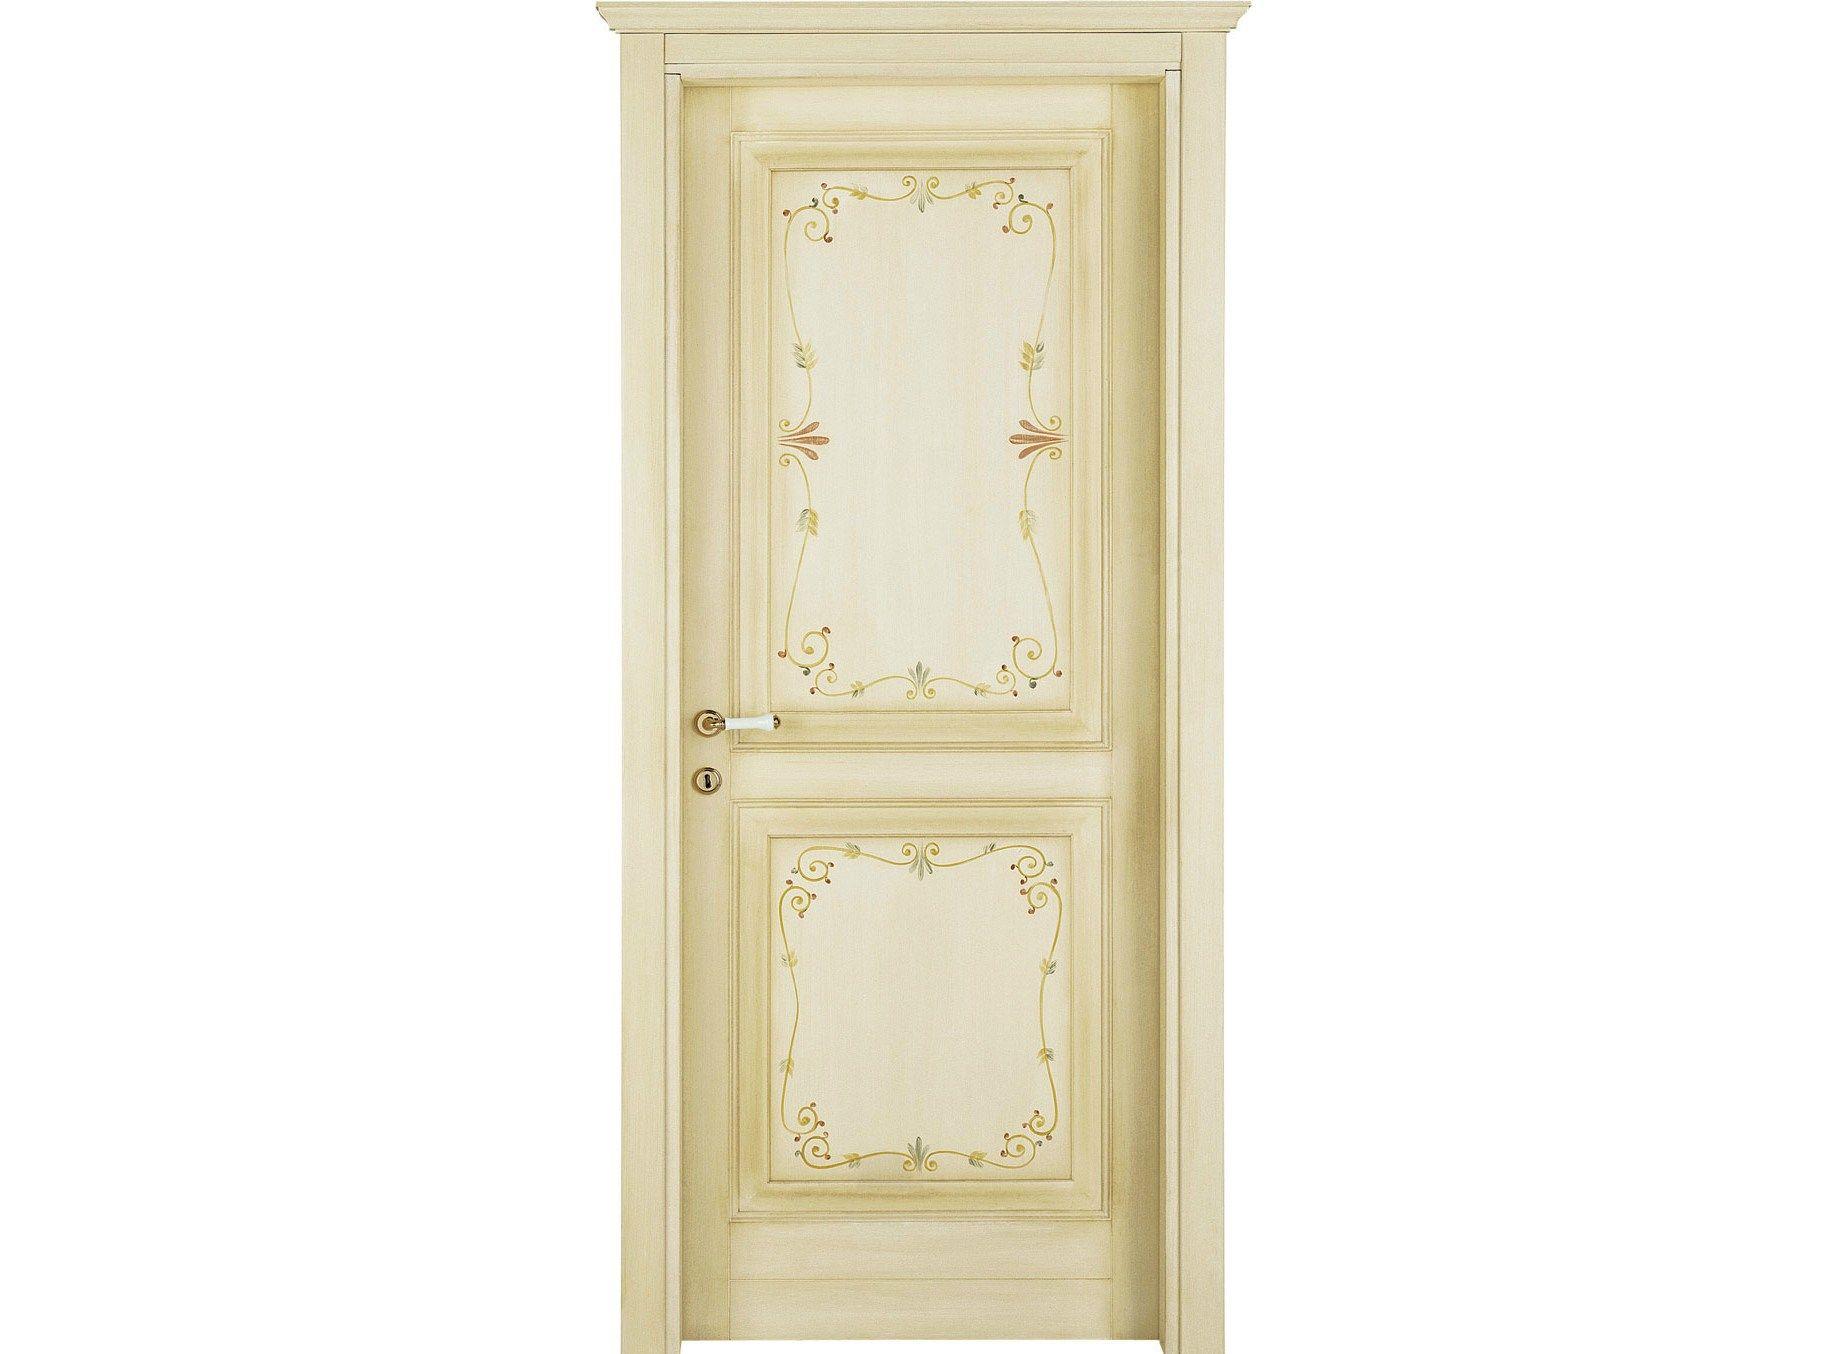 Деревянная дверь LUNAMARE - LE PORTE Коллекция Lunamare by DI.BI ...